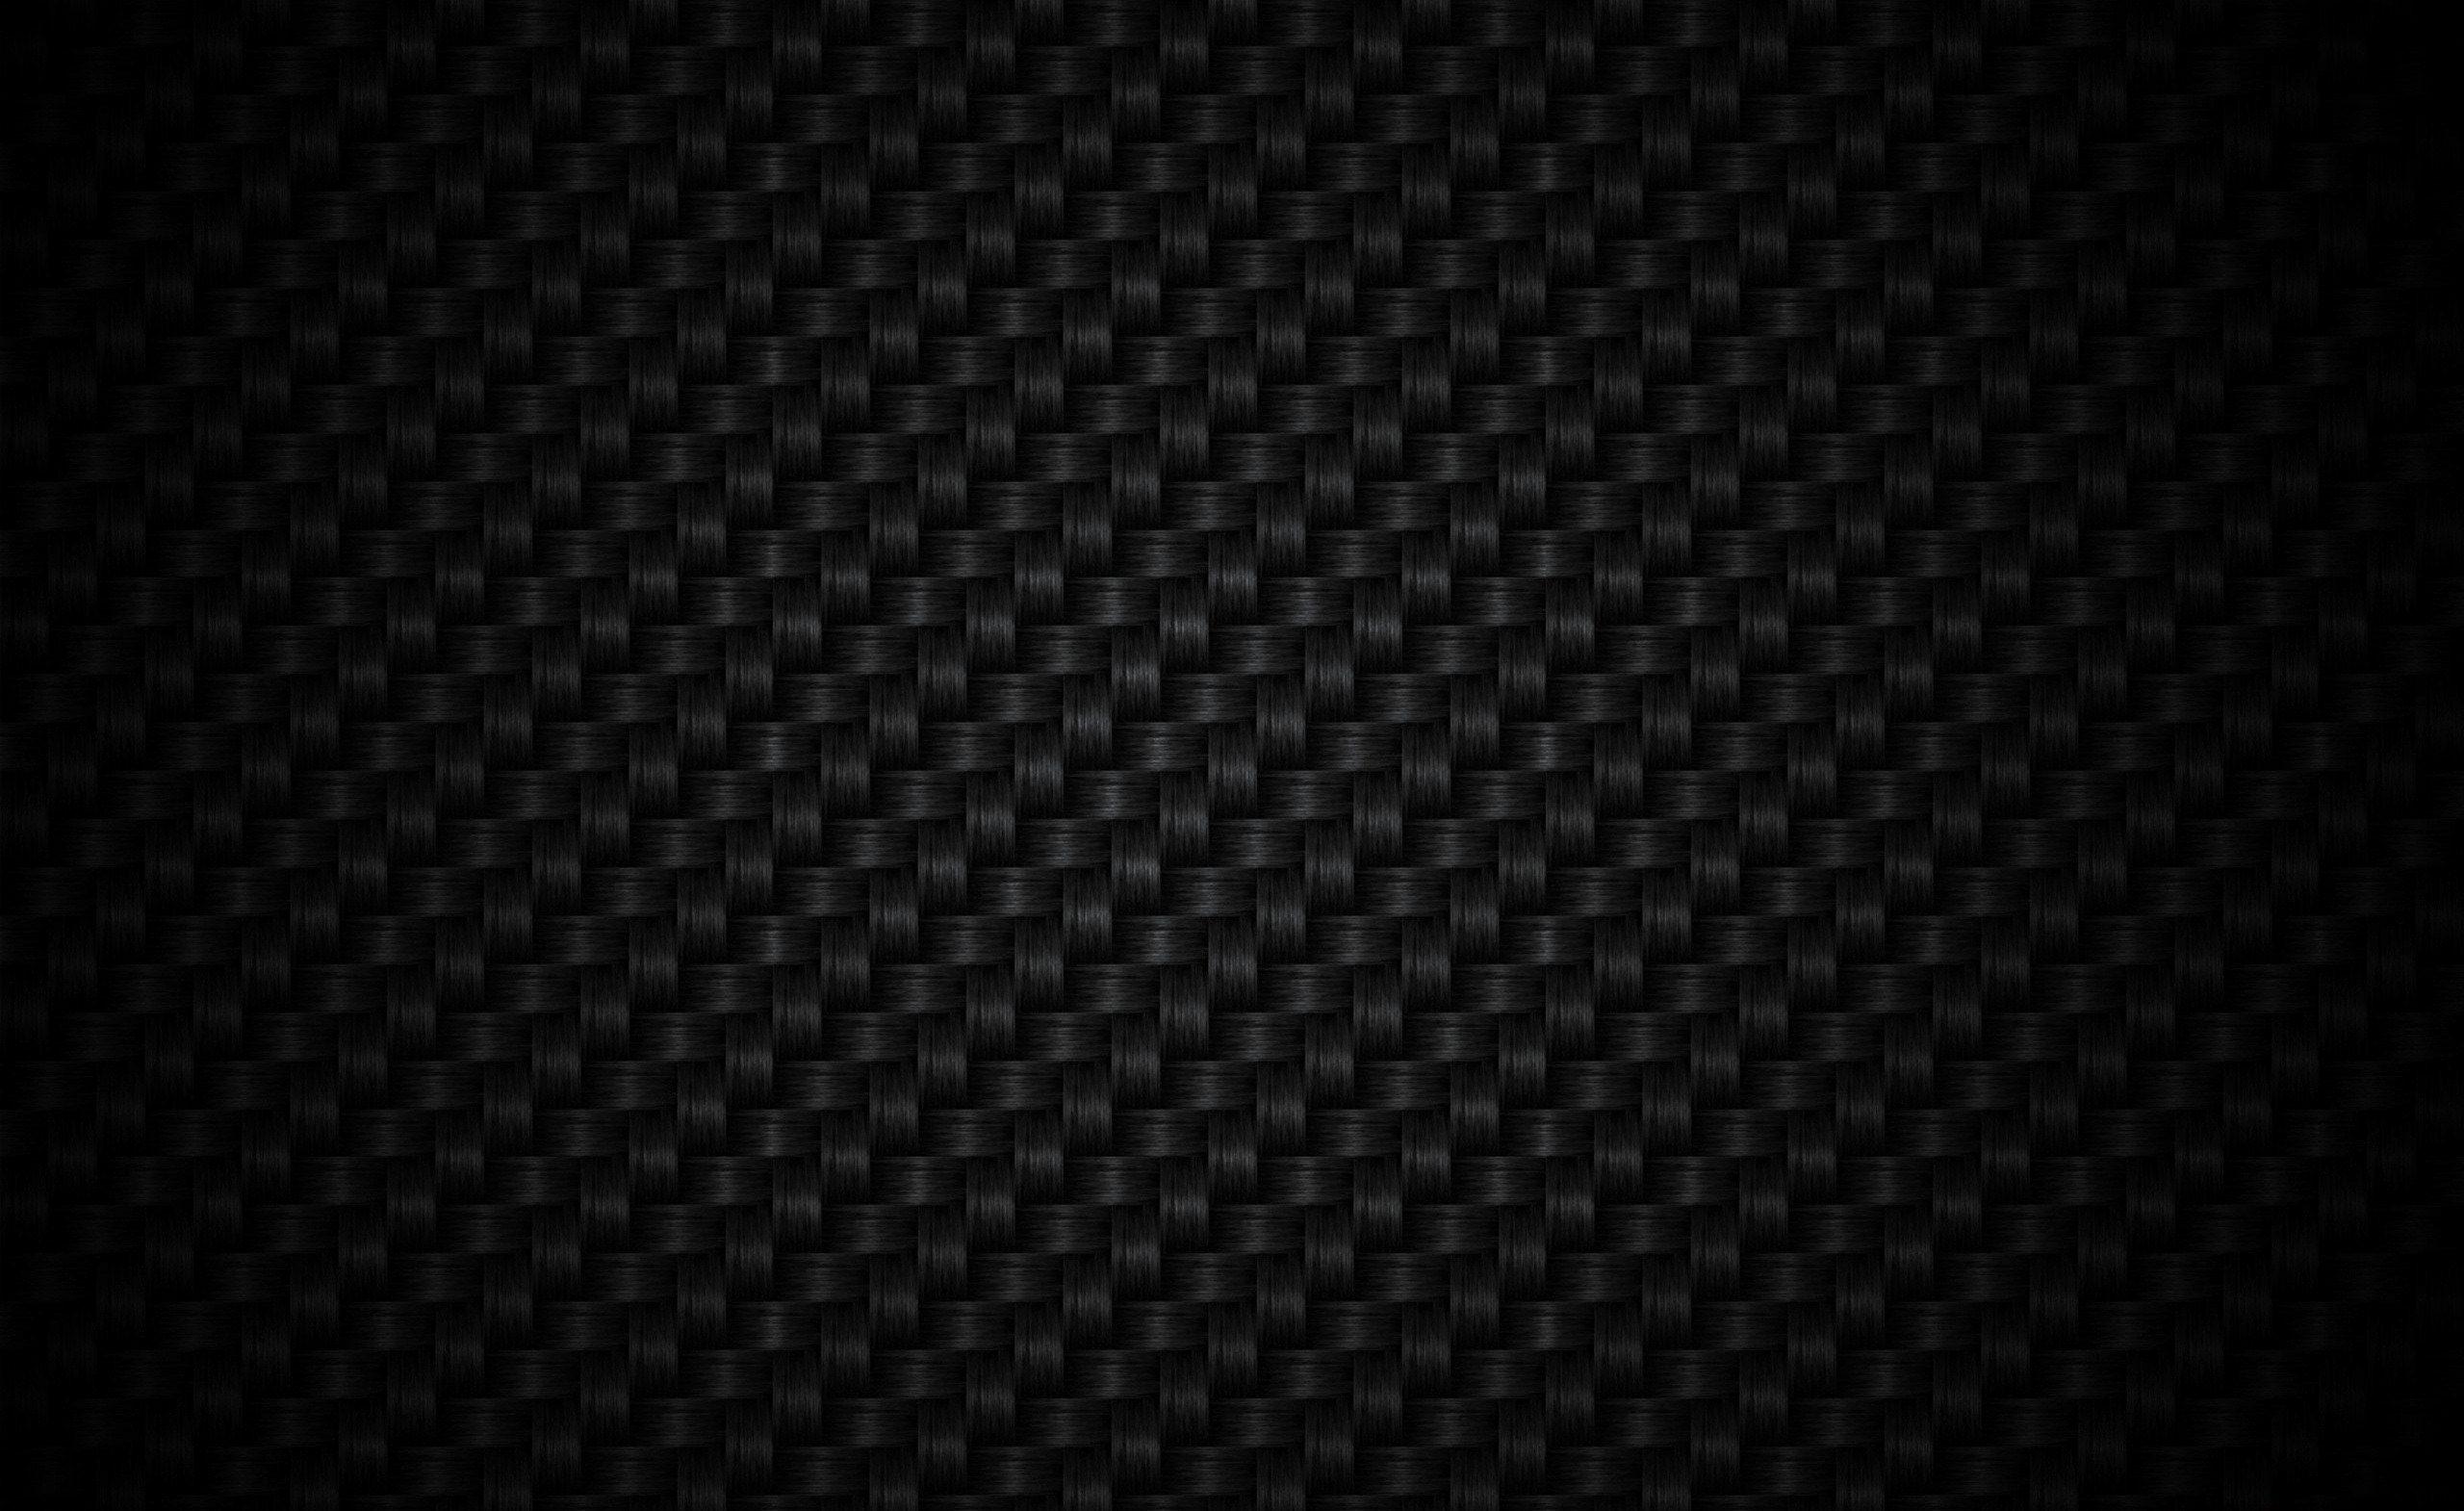 Download Black Texture Wallpaper 2560x1570 Full HD Wallpapers 2560x1570